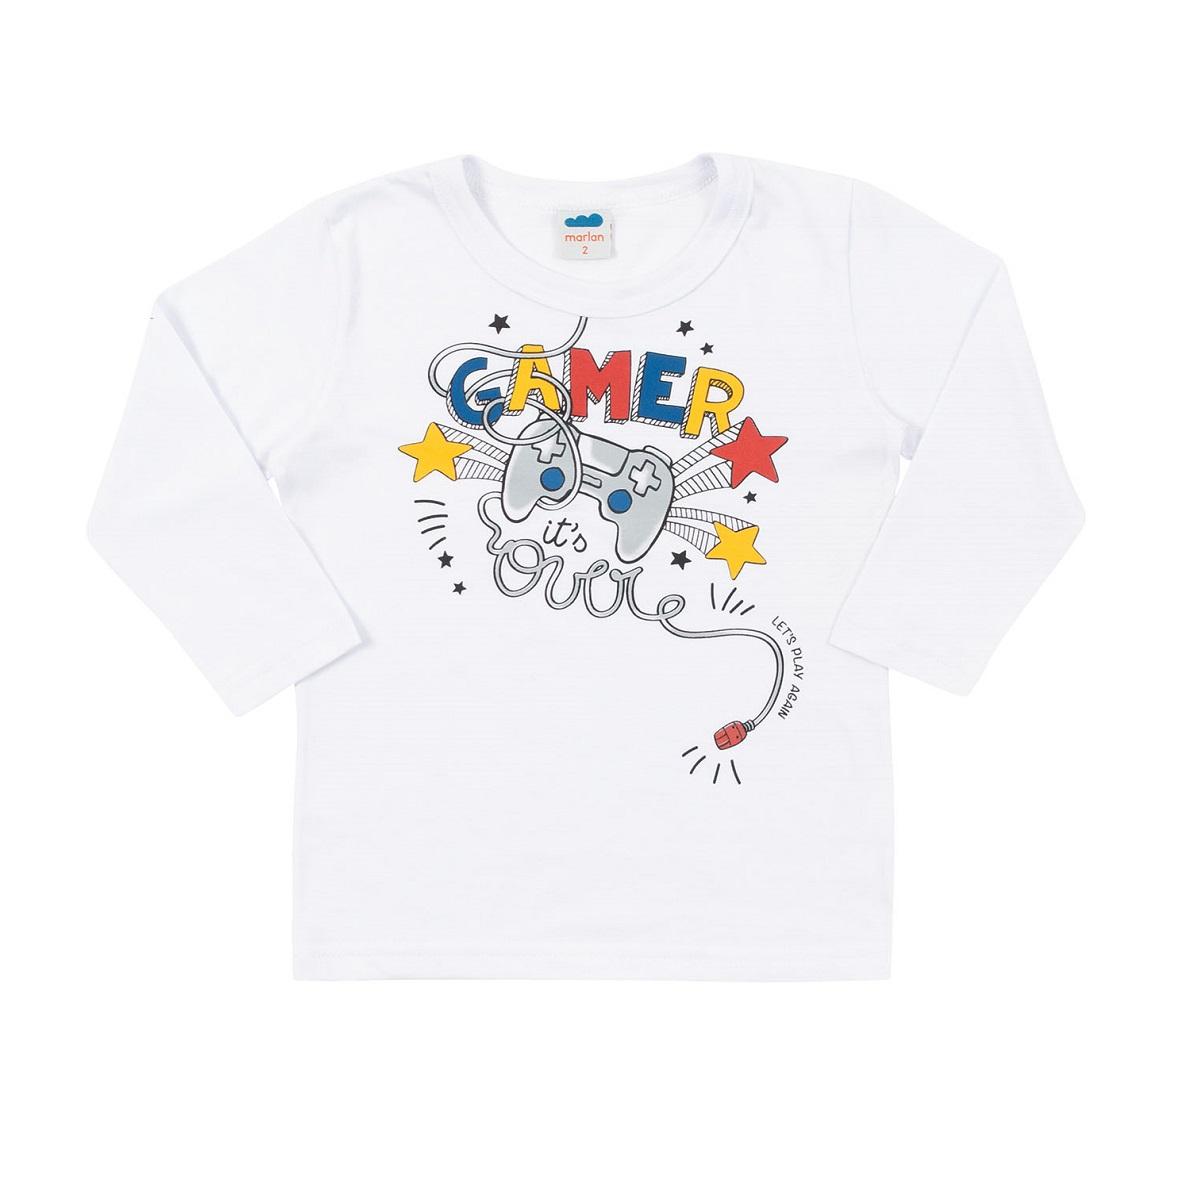 Camiseta Infantil Masculina - MARLAN 22575